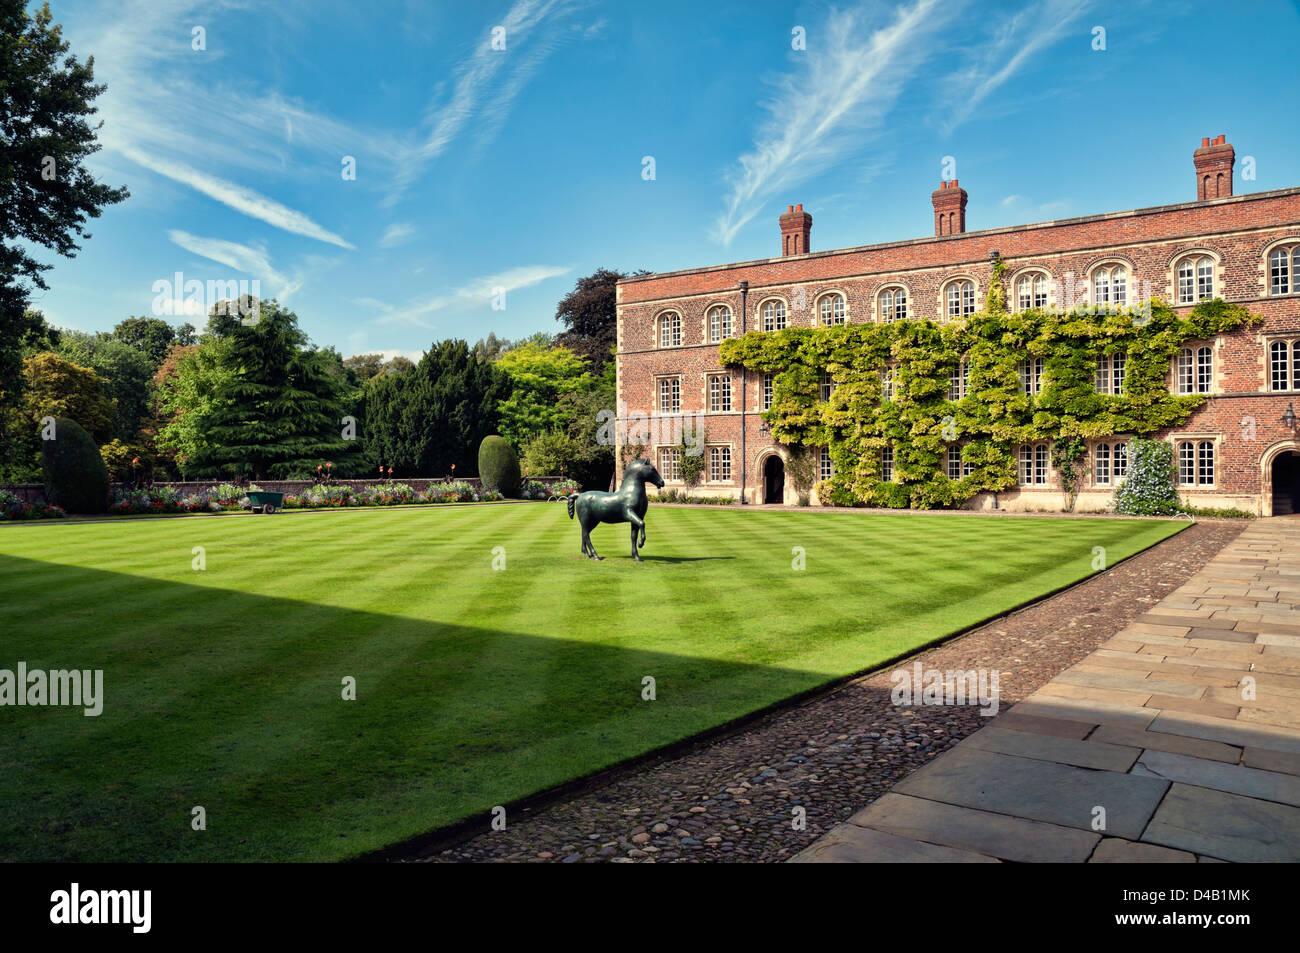 First Court, Jesus College, Cambridge. - Stock Image